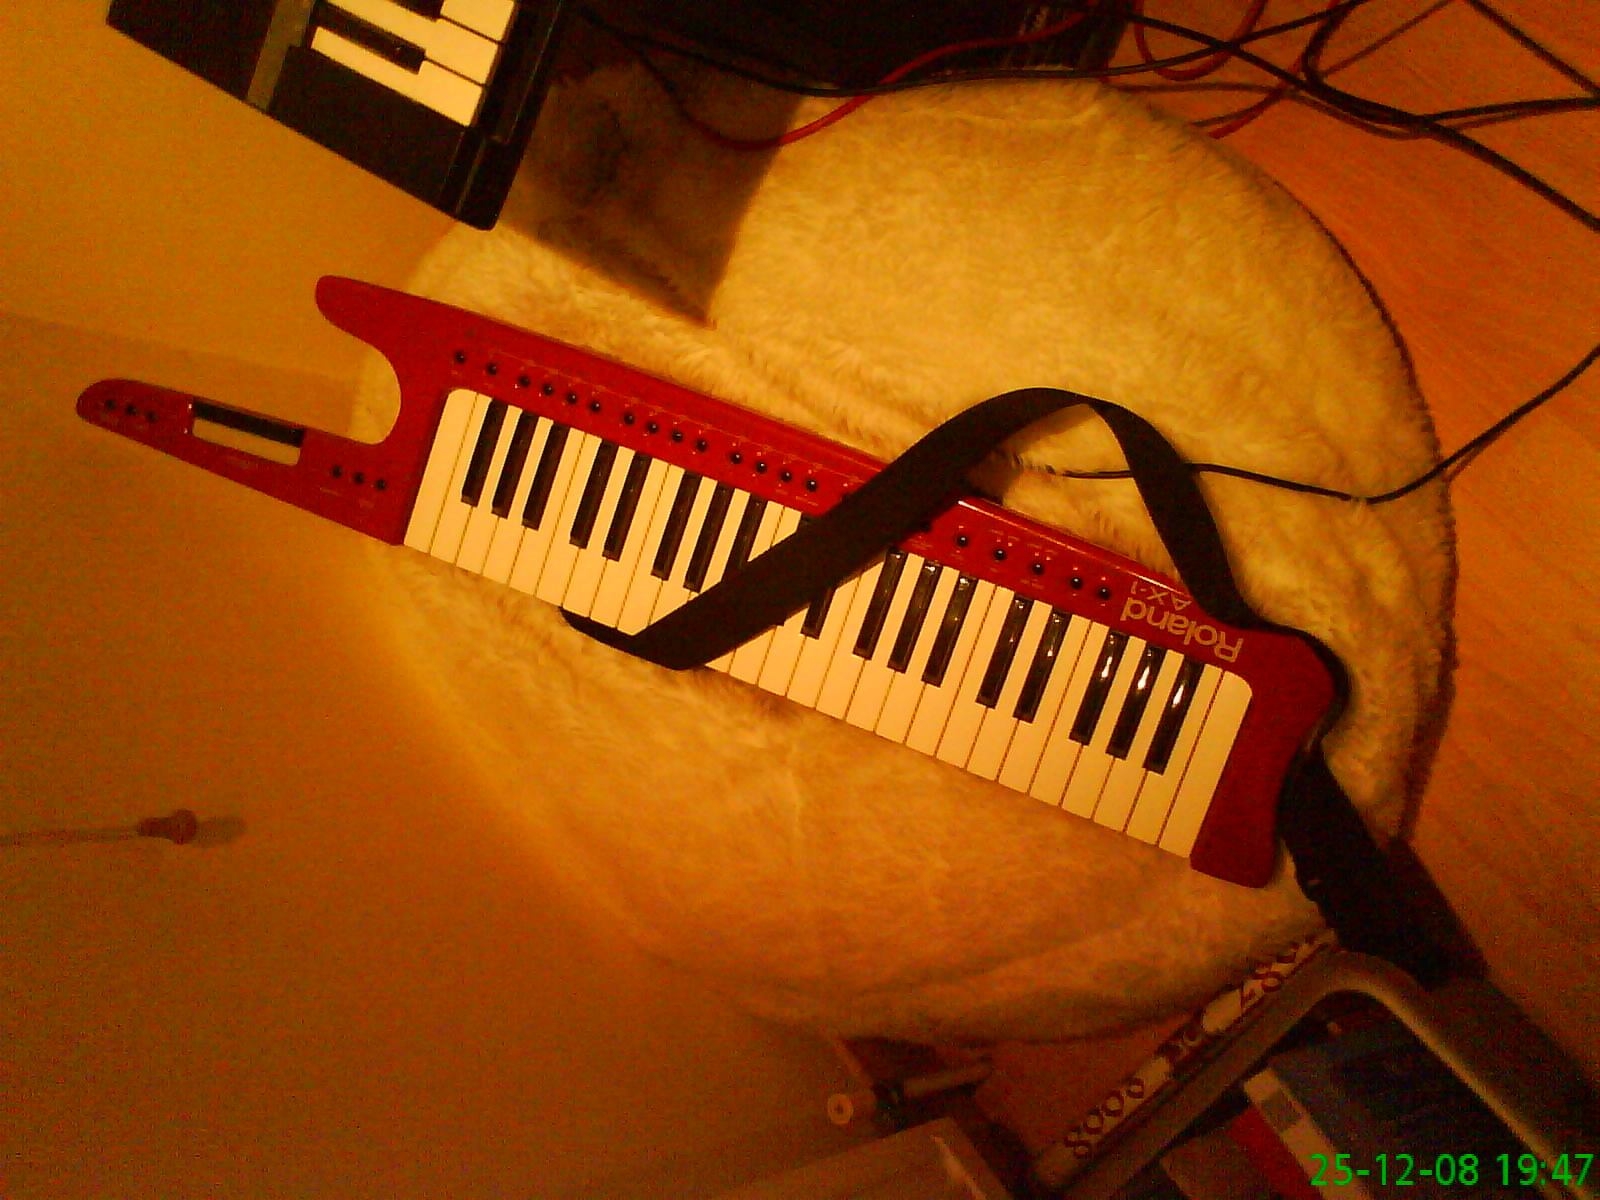 haak midi keyboard aan fl studio